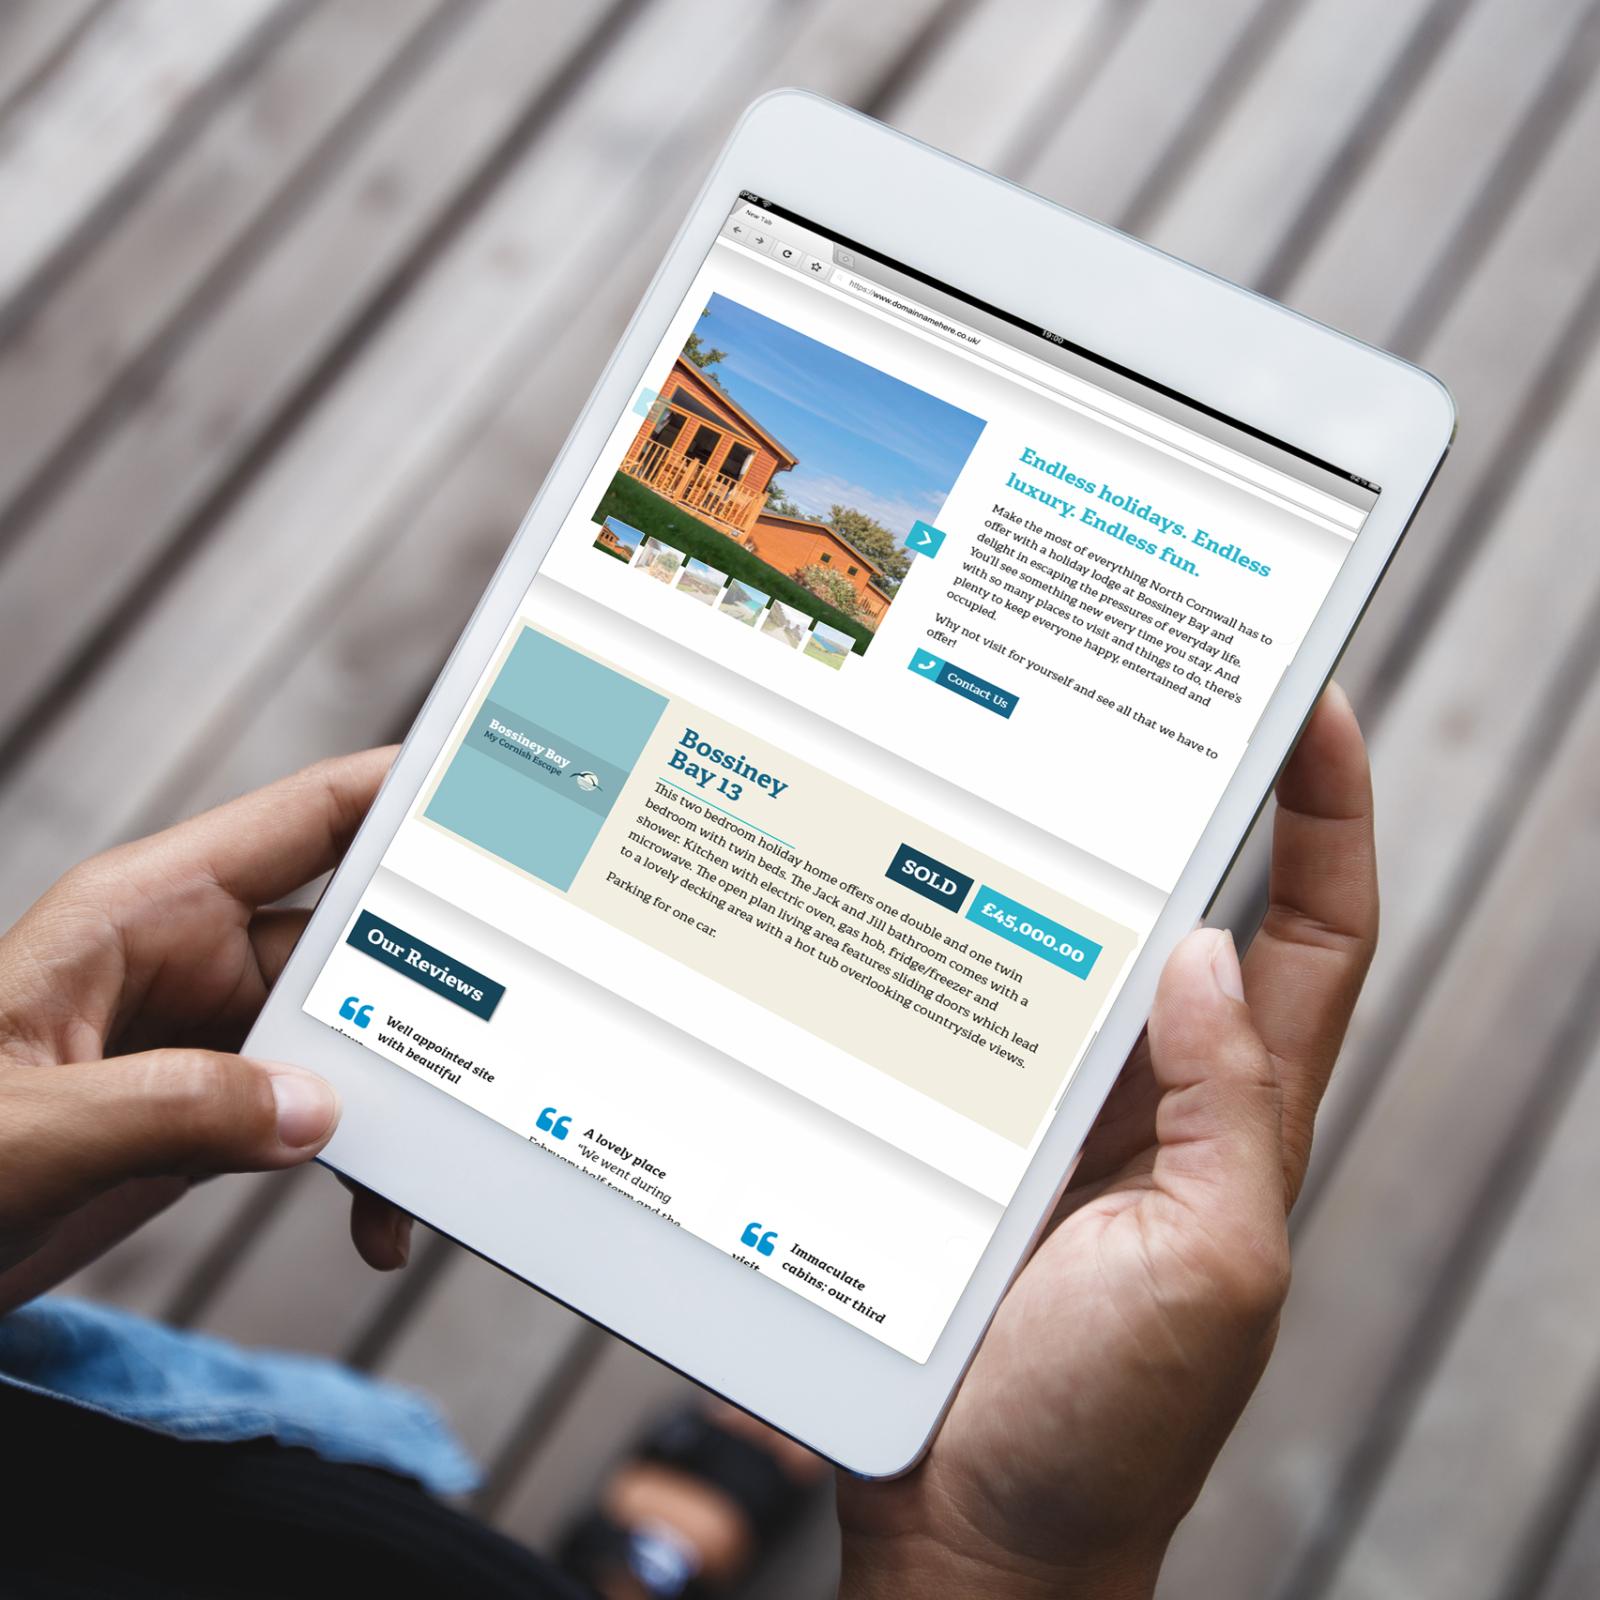 Holiday website designed for Bossiney BayWeb Design Case Study